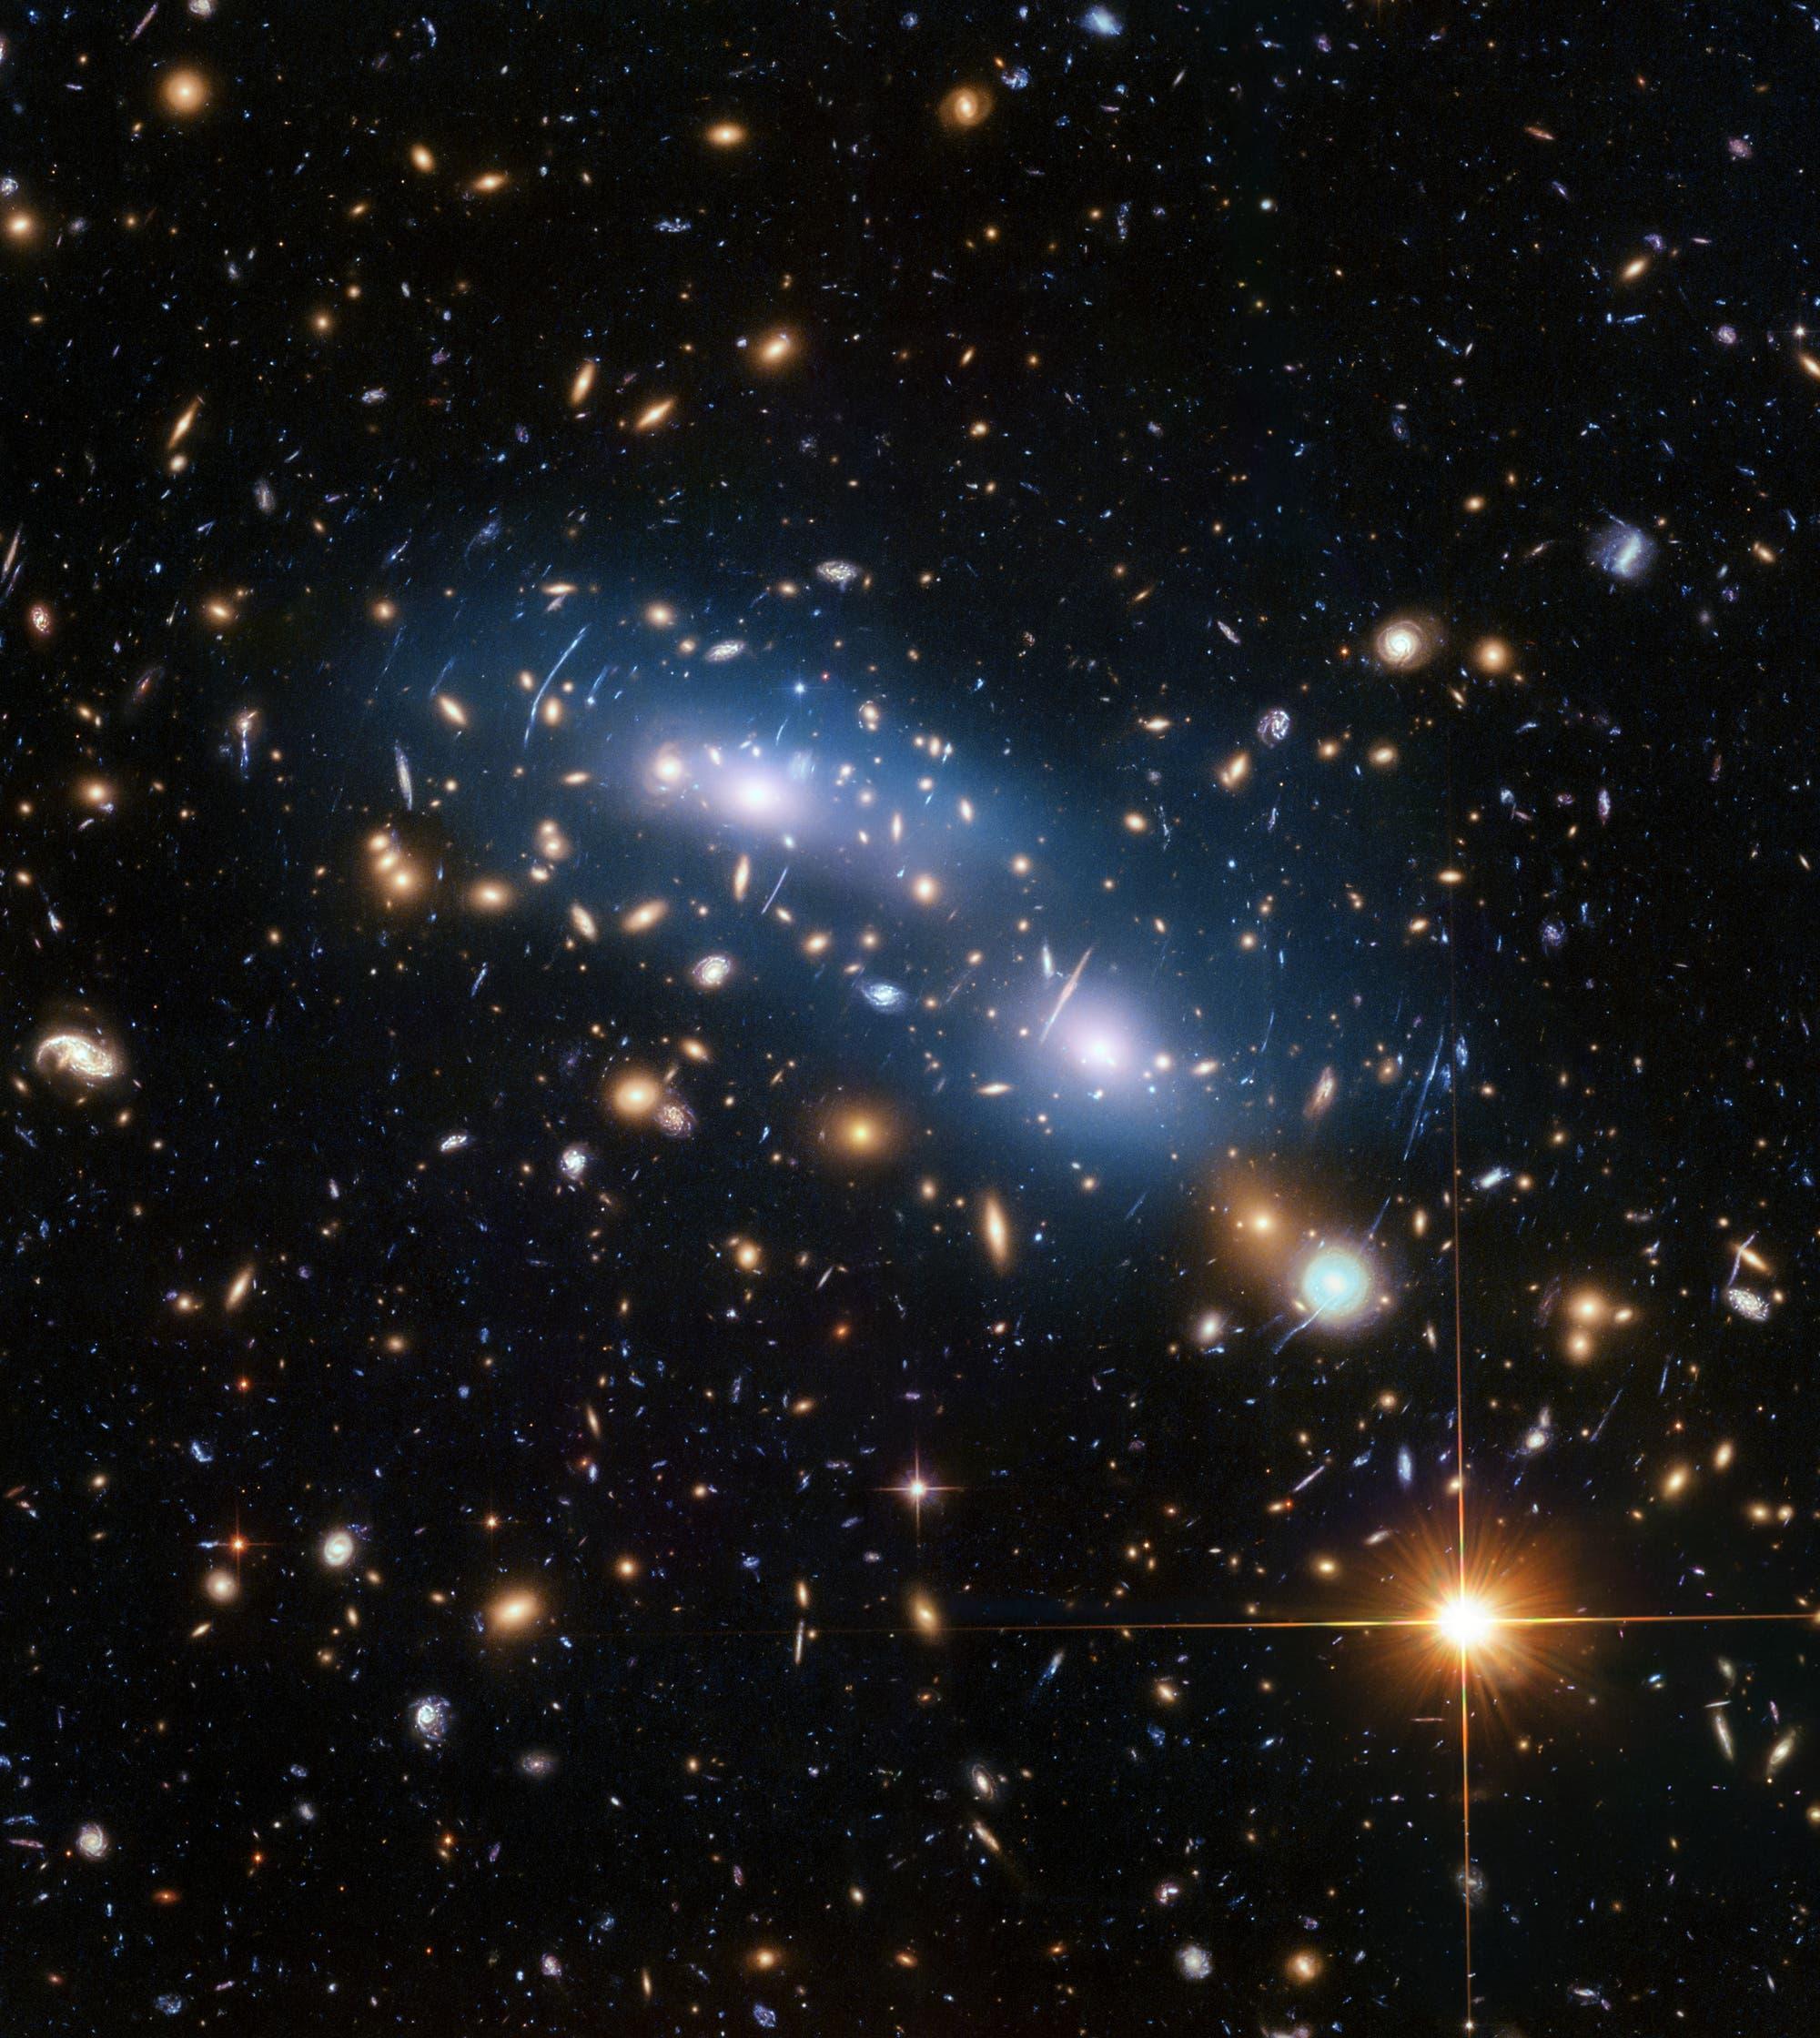 Der Galaxienhaufen MACS J0416.1 – 2403